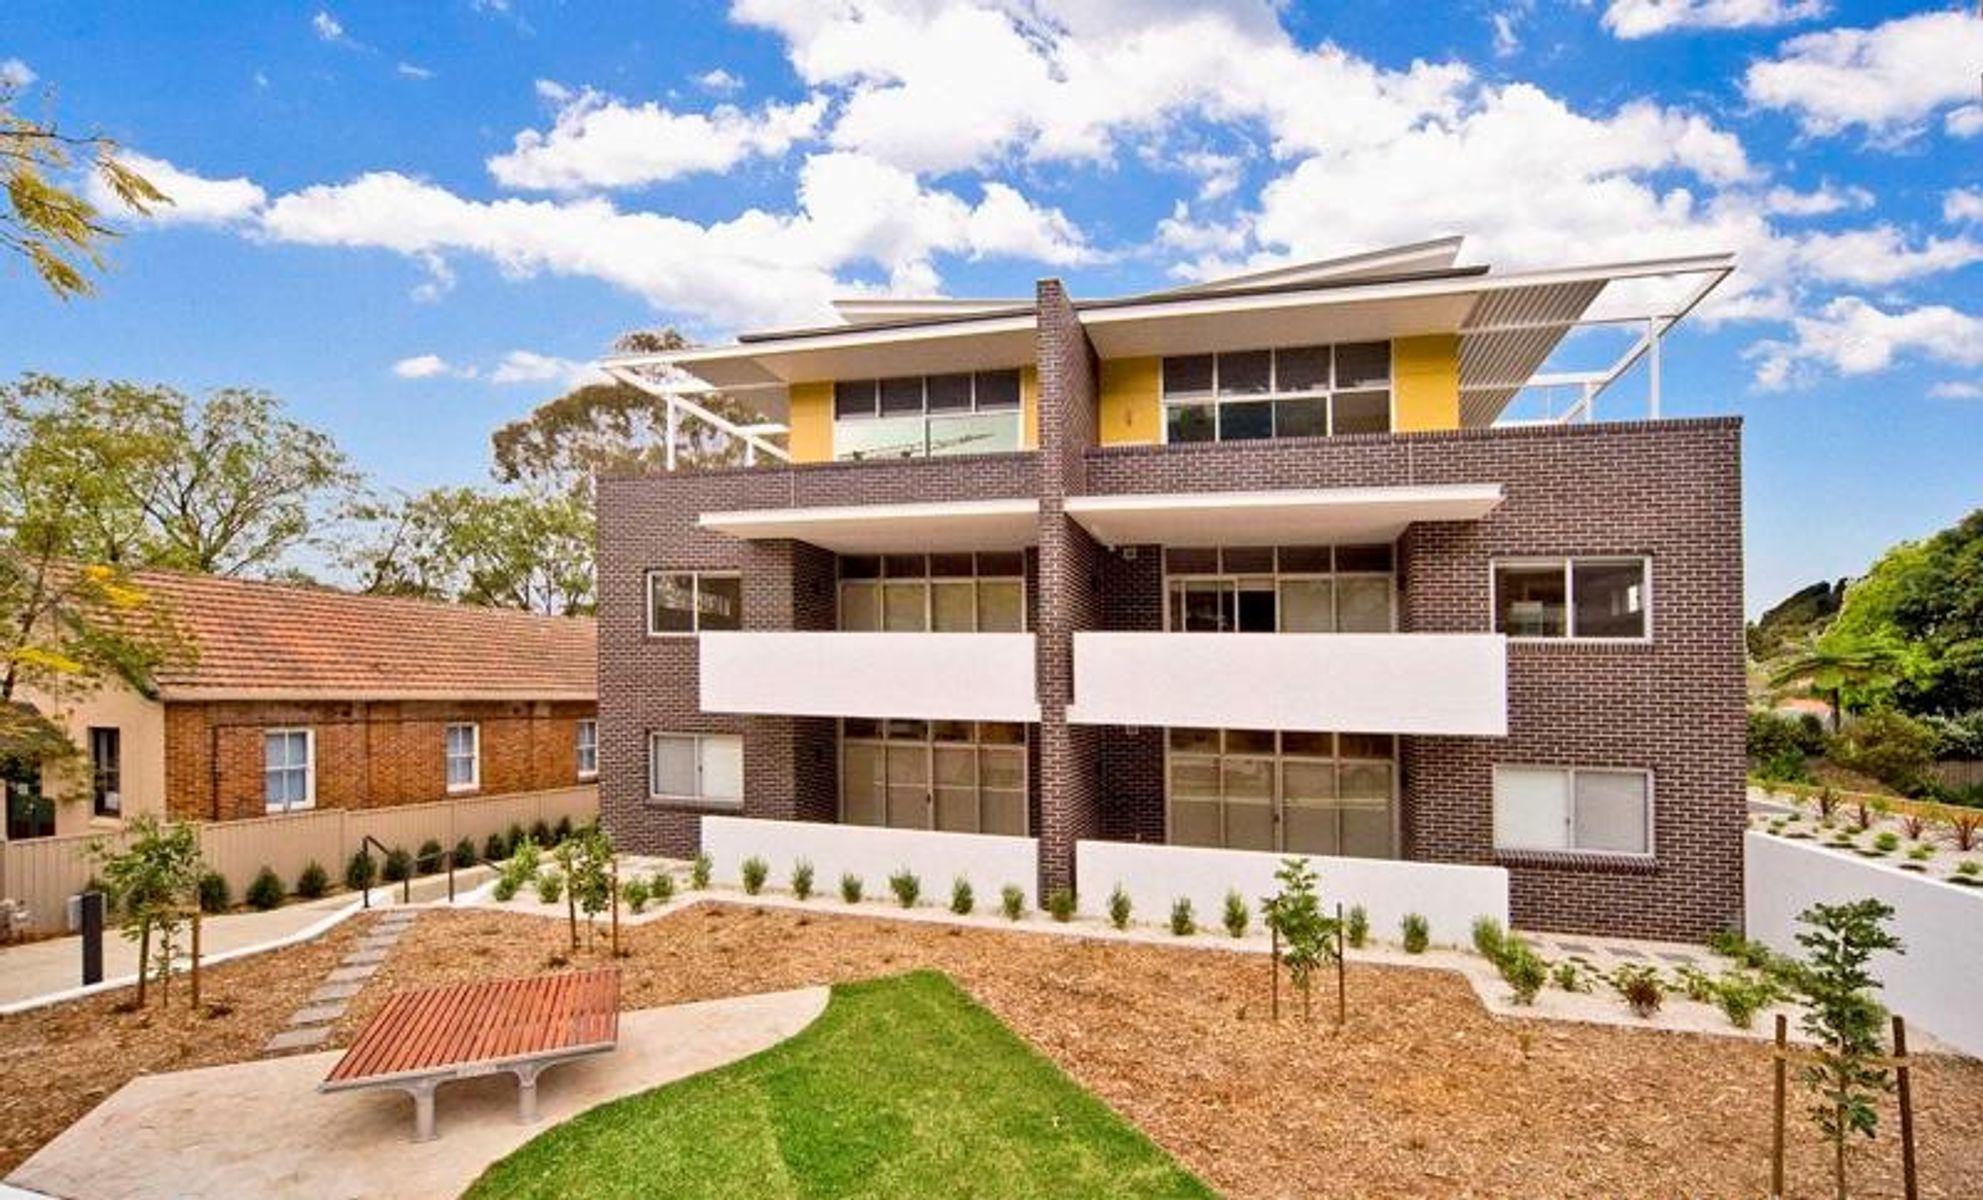 8/4-6 Ellis Street, Chatswood, NSW 2067